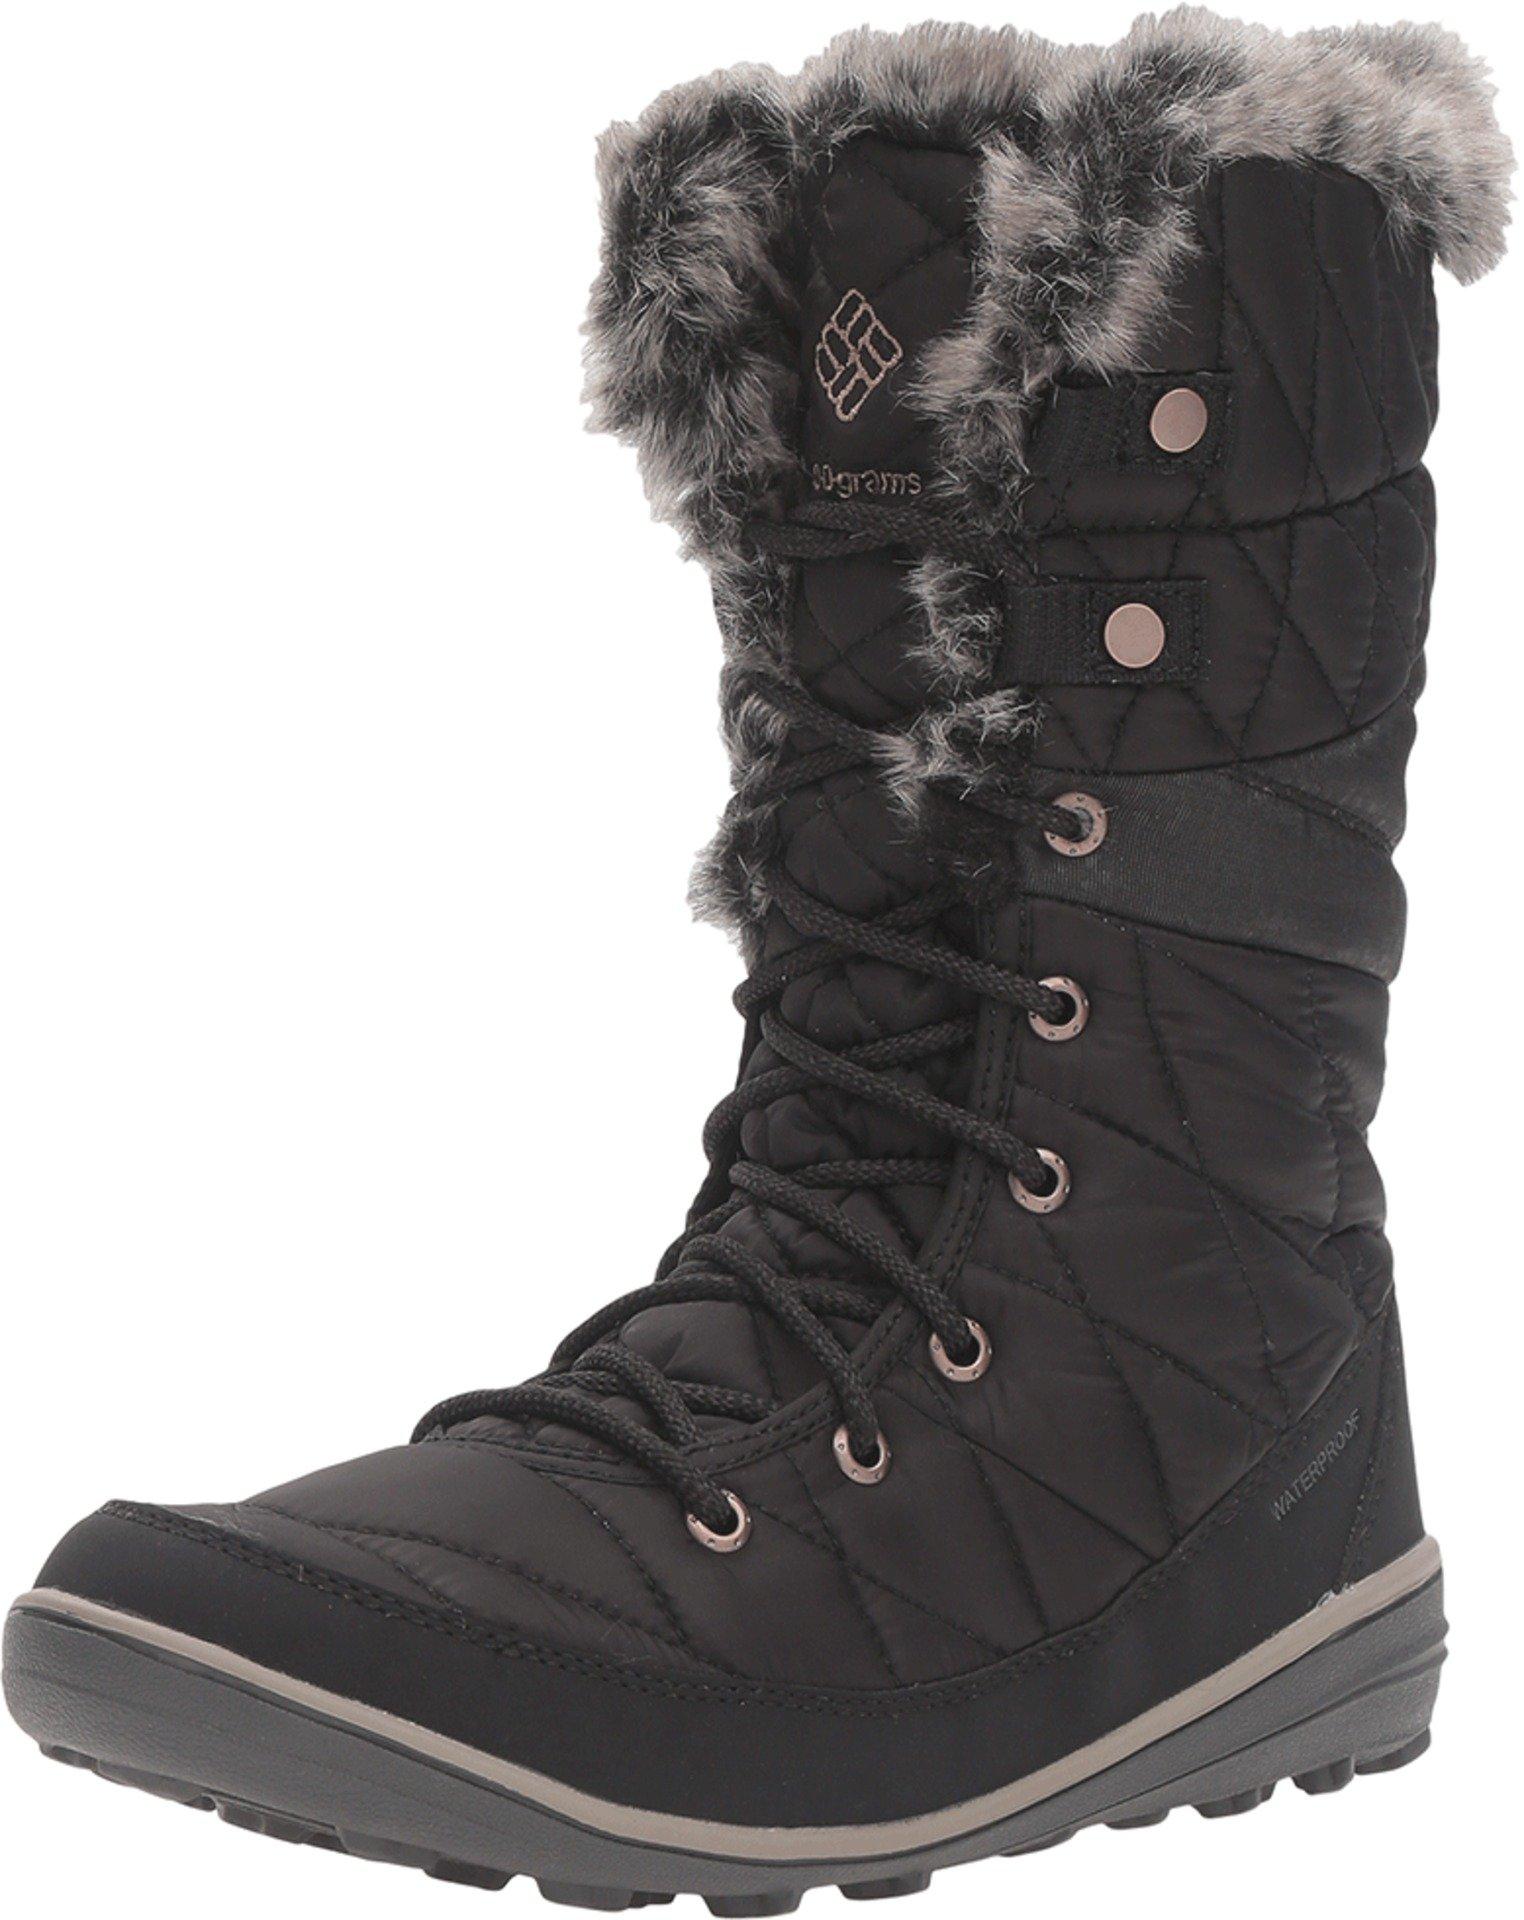 Columbia Heavenly Omni-Heat Snow Boot Winter Shoe - Black/Kettle - Womens - 8.5